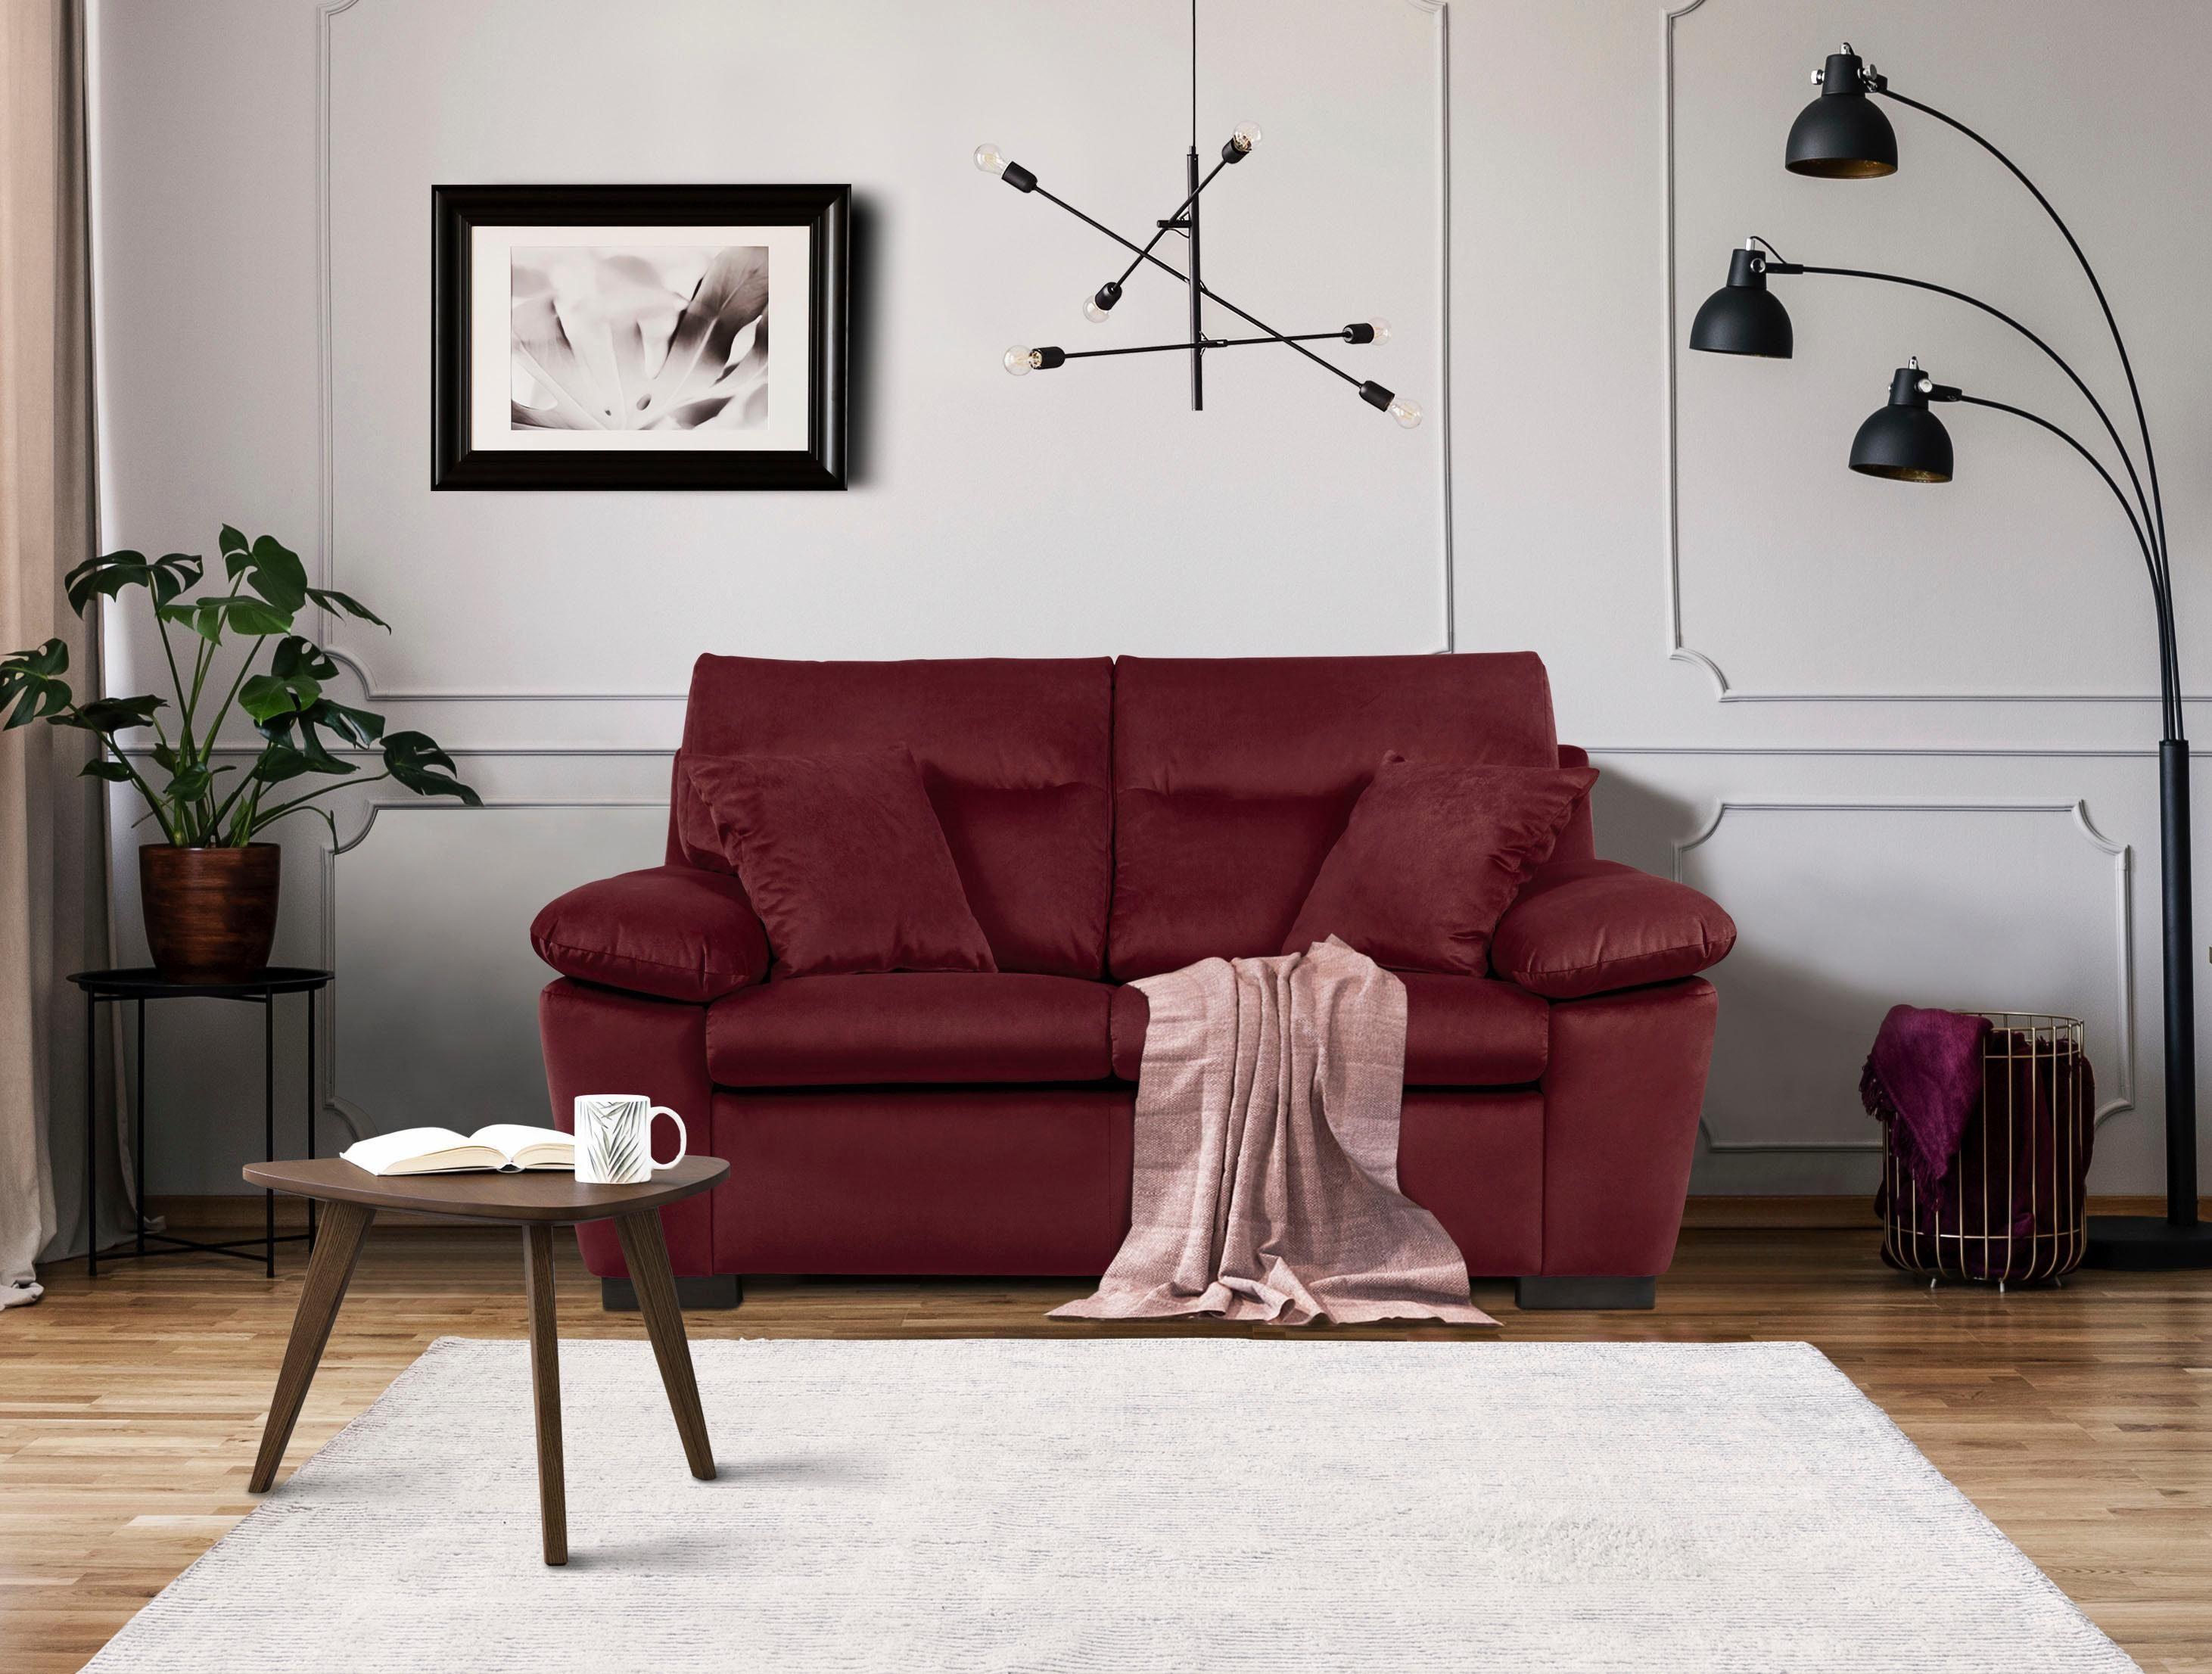 Home affaire 2-Sitzer »Sofie« in klassisch-modernem Design